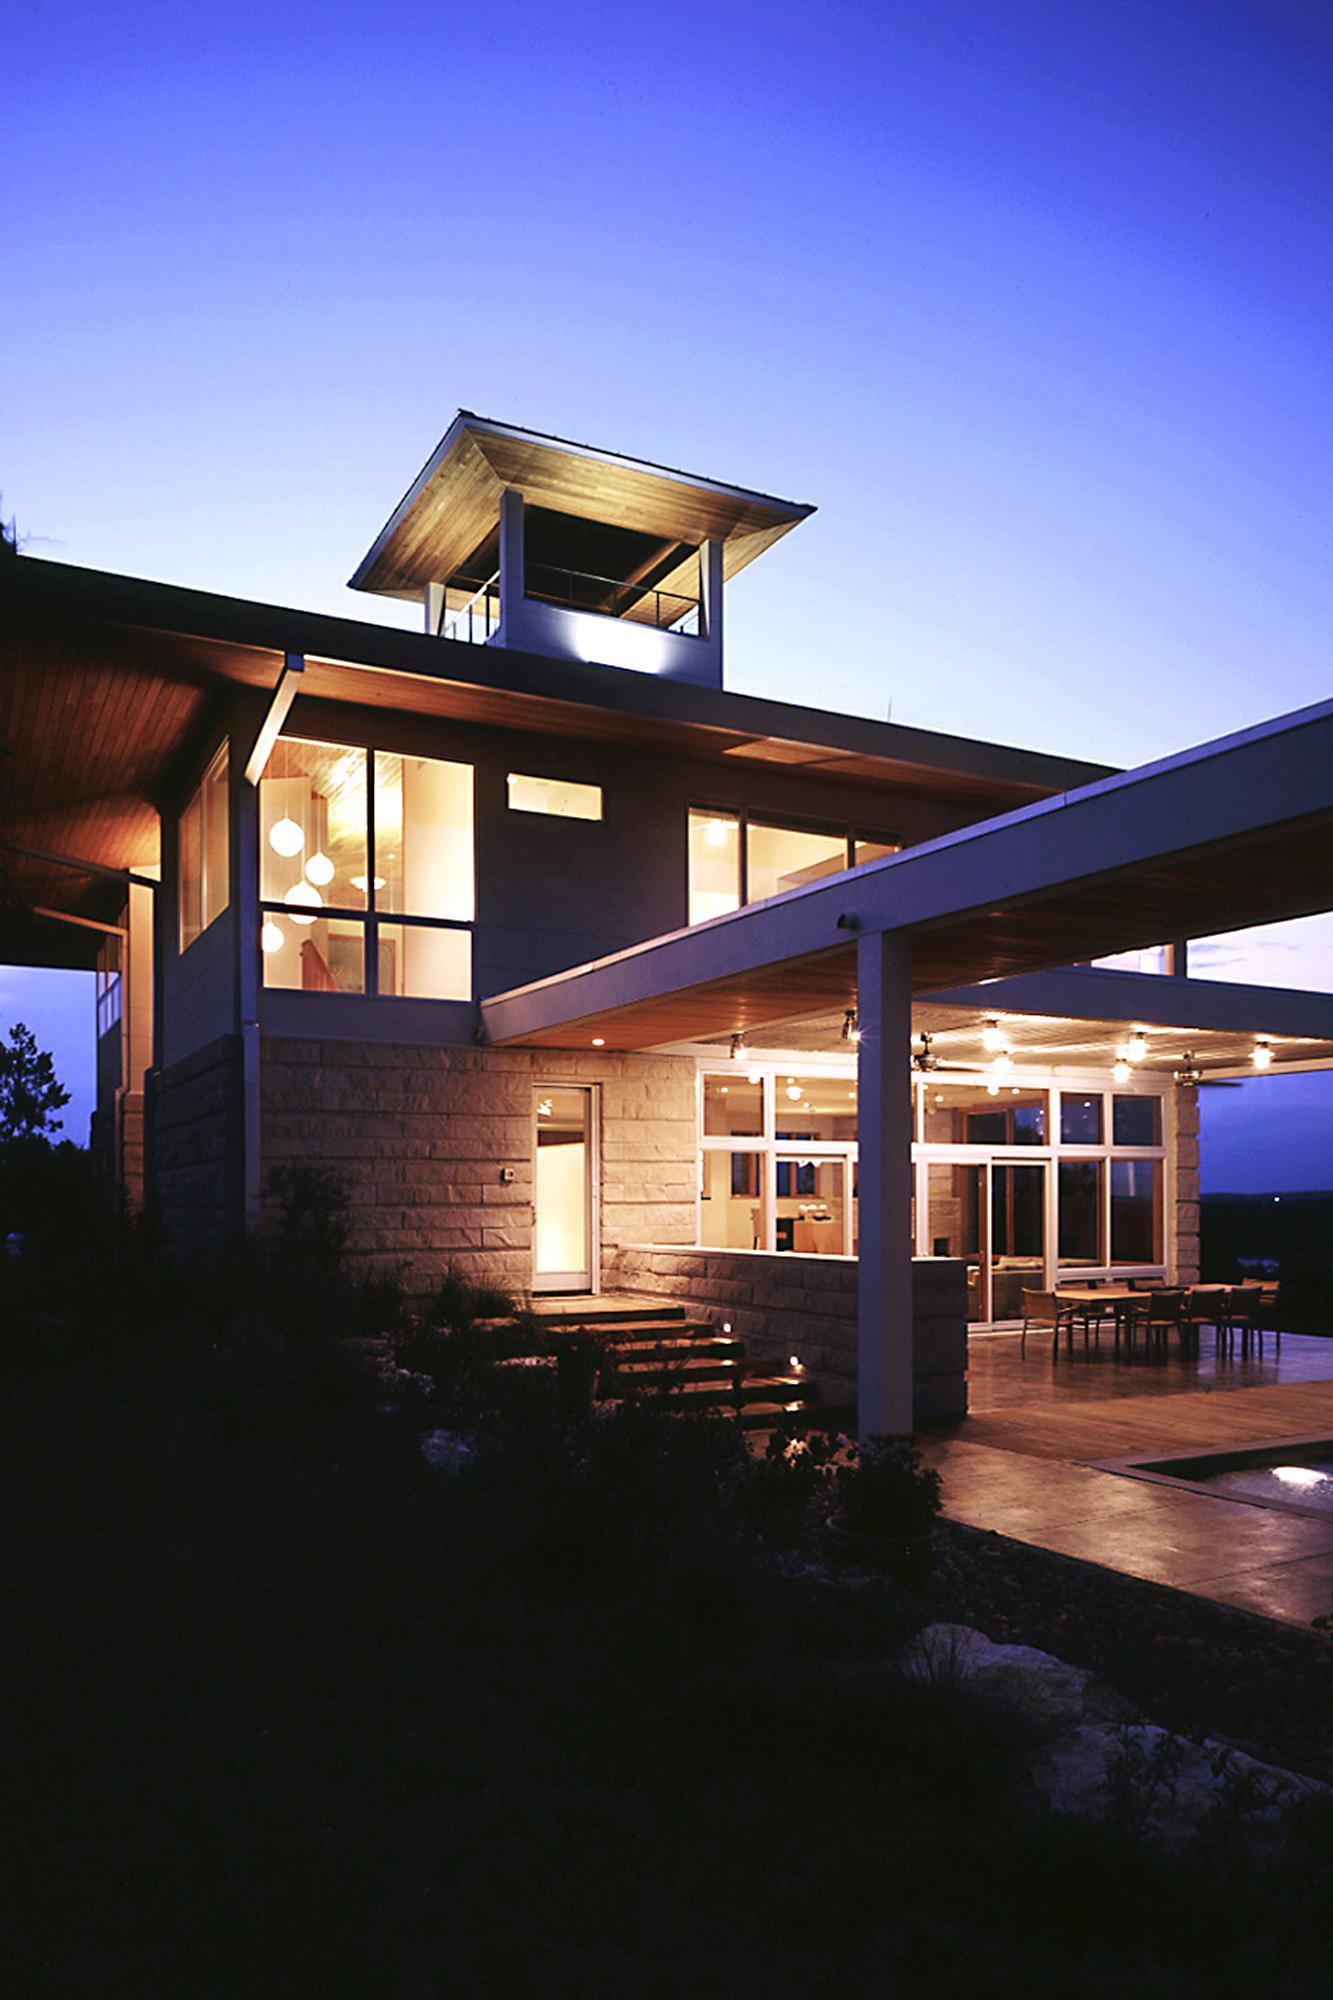 11_Spicewood Residence.jpg